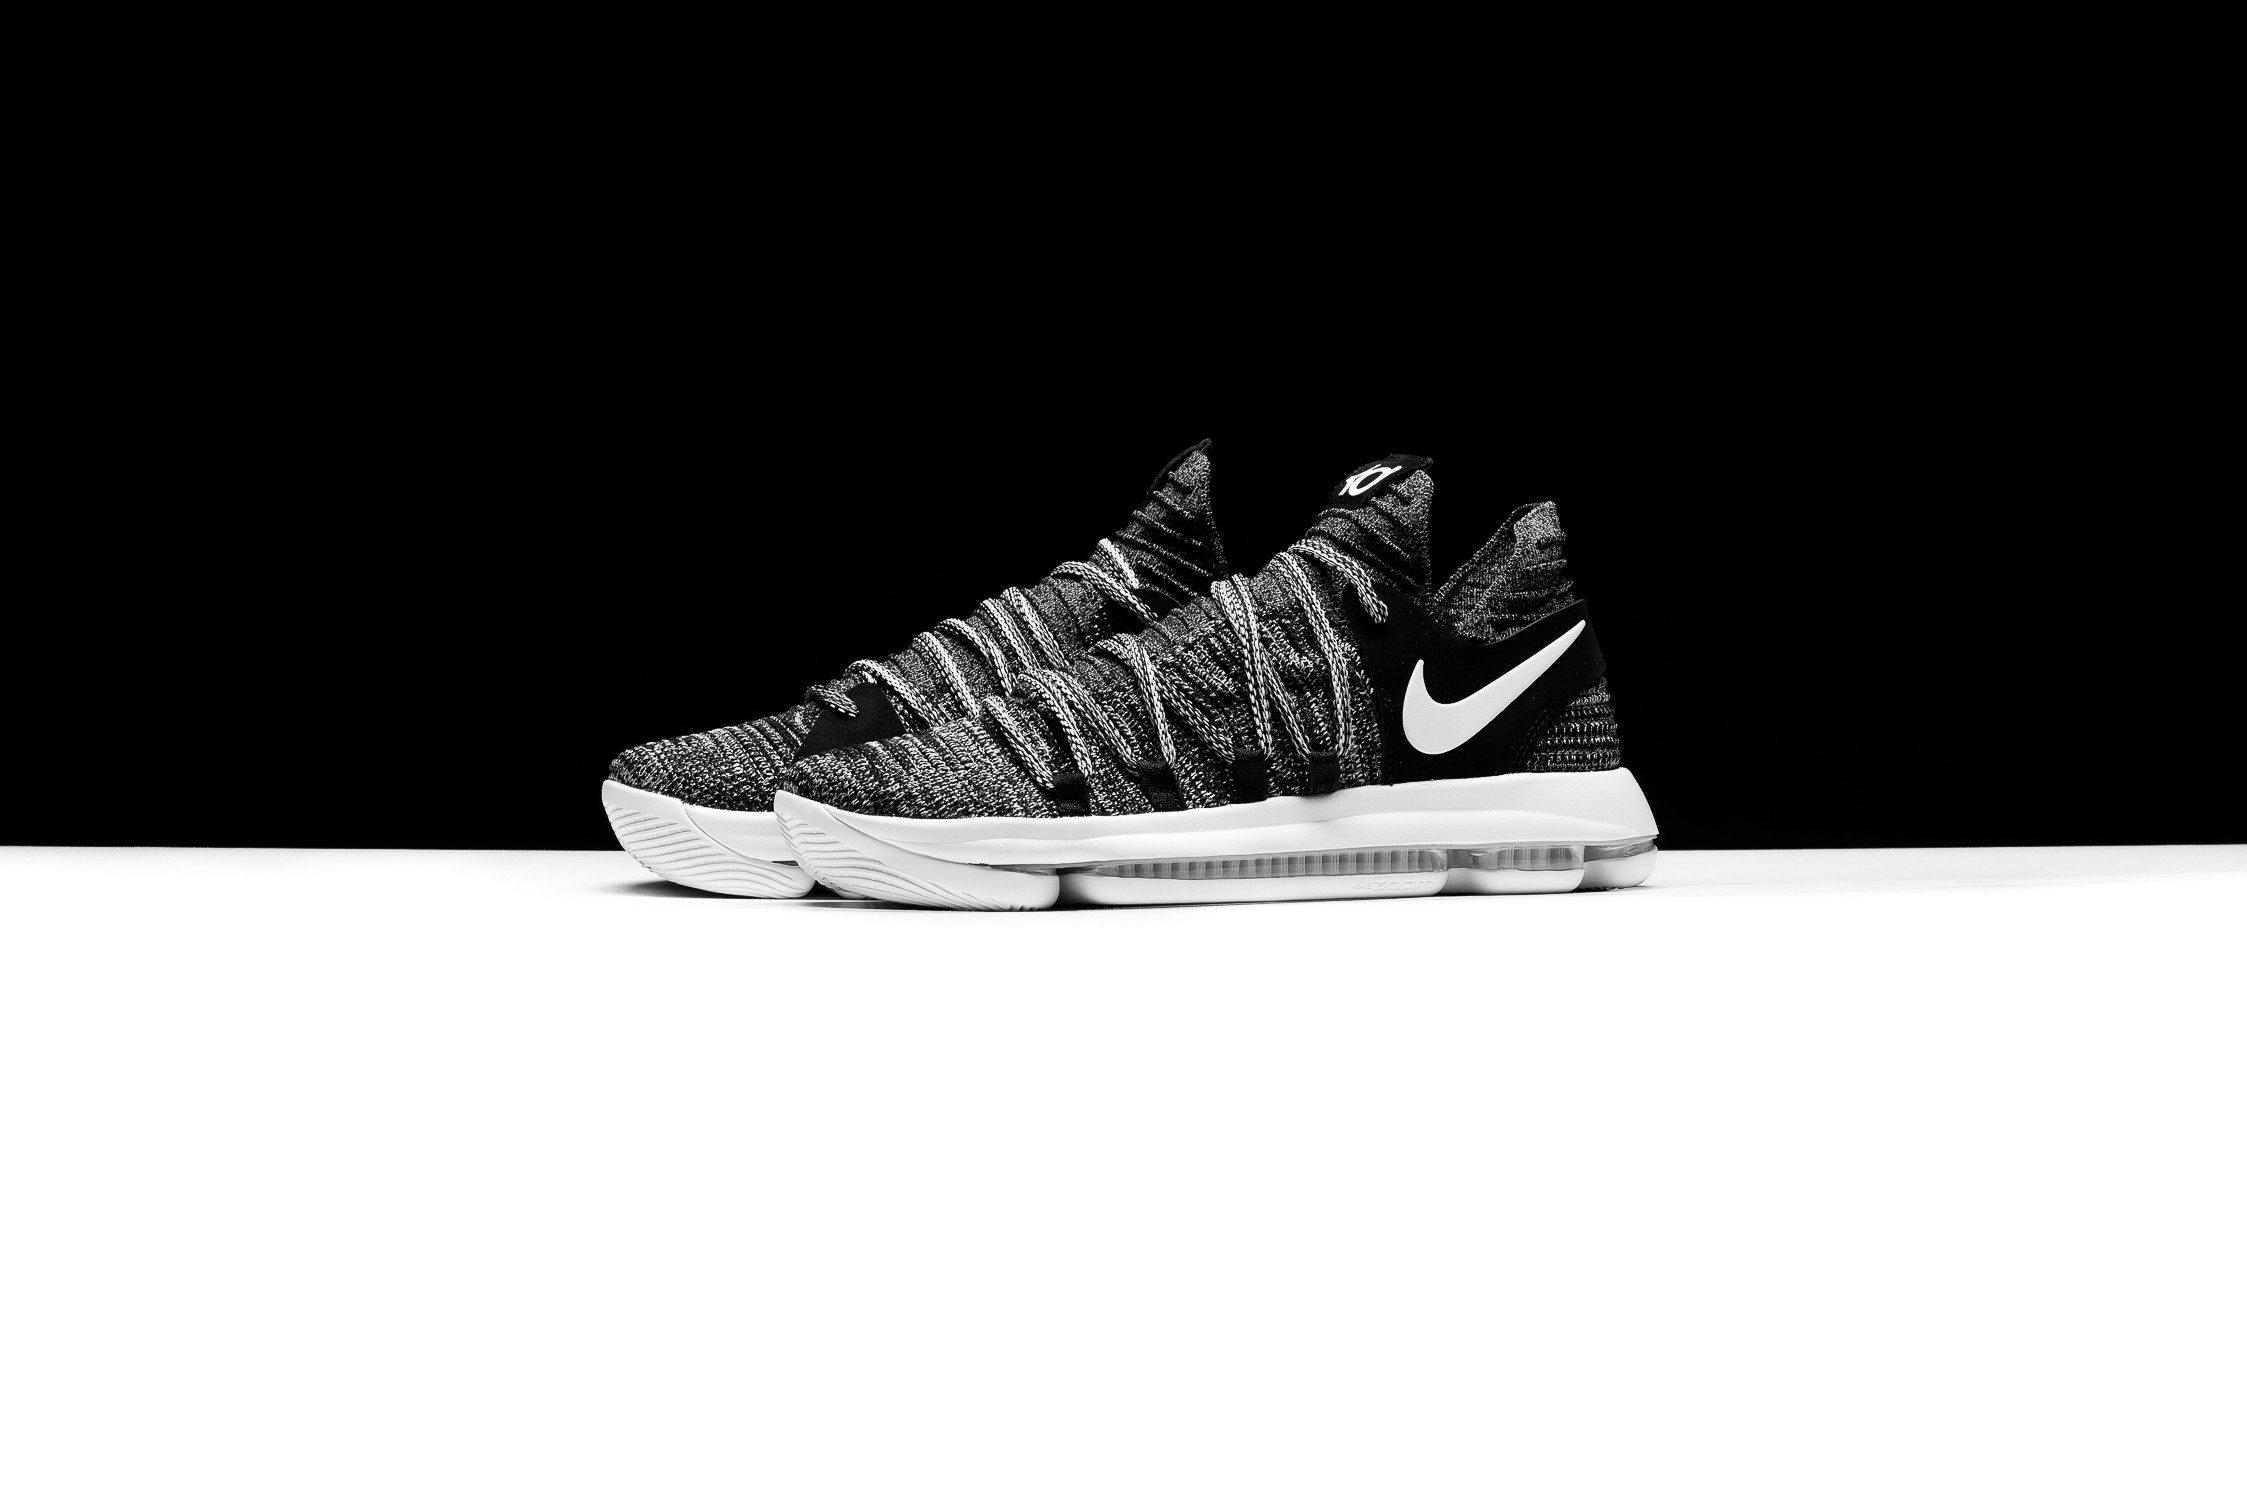 Kdx Kicks Releases Fingerprint WeekendNice This Nike E92YDIWH